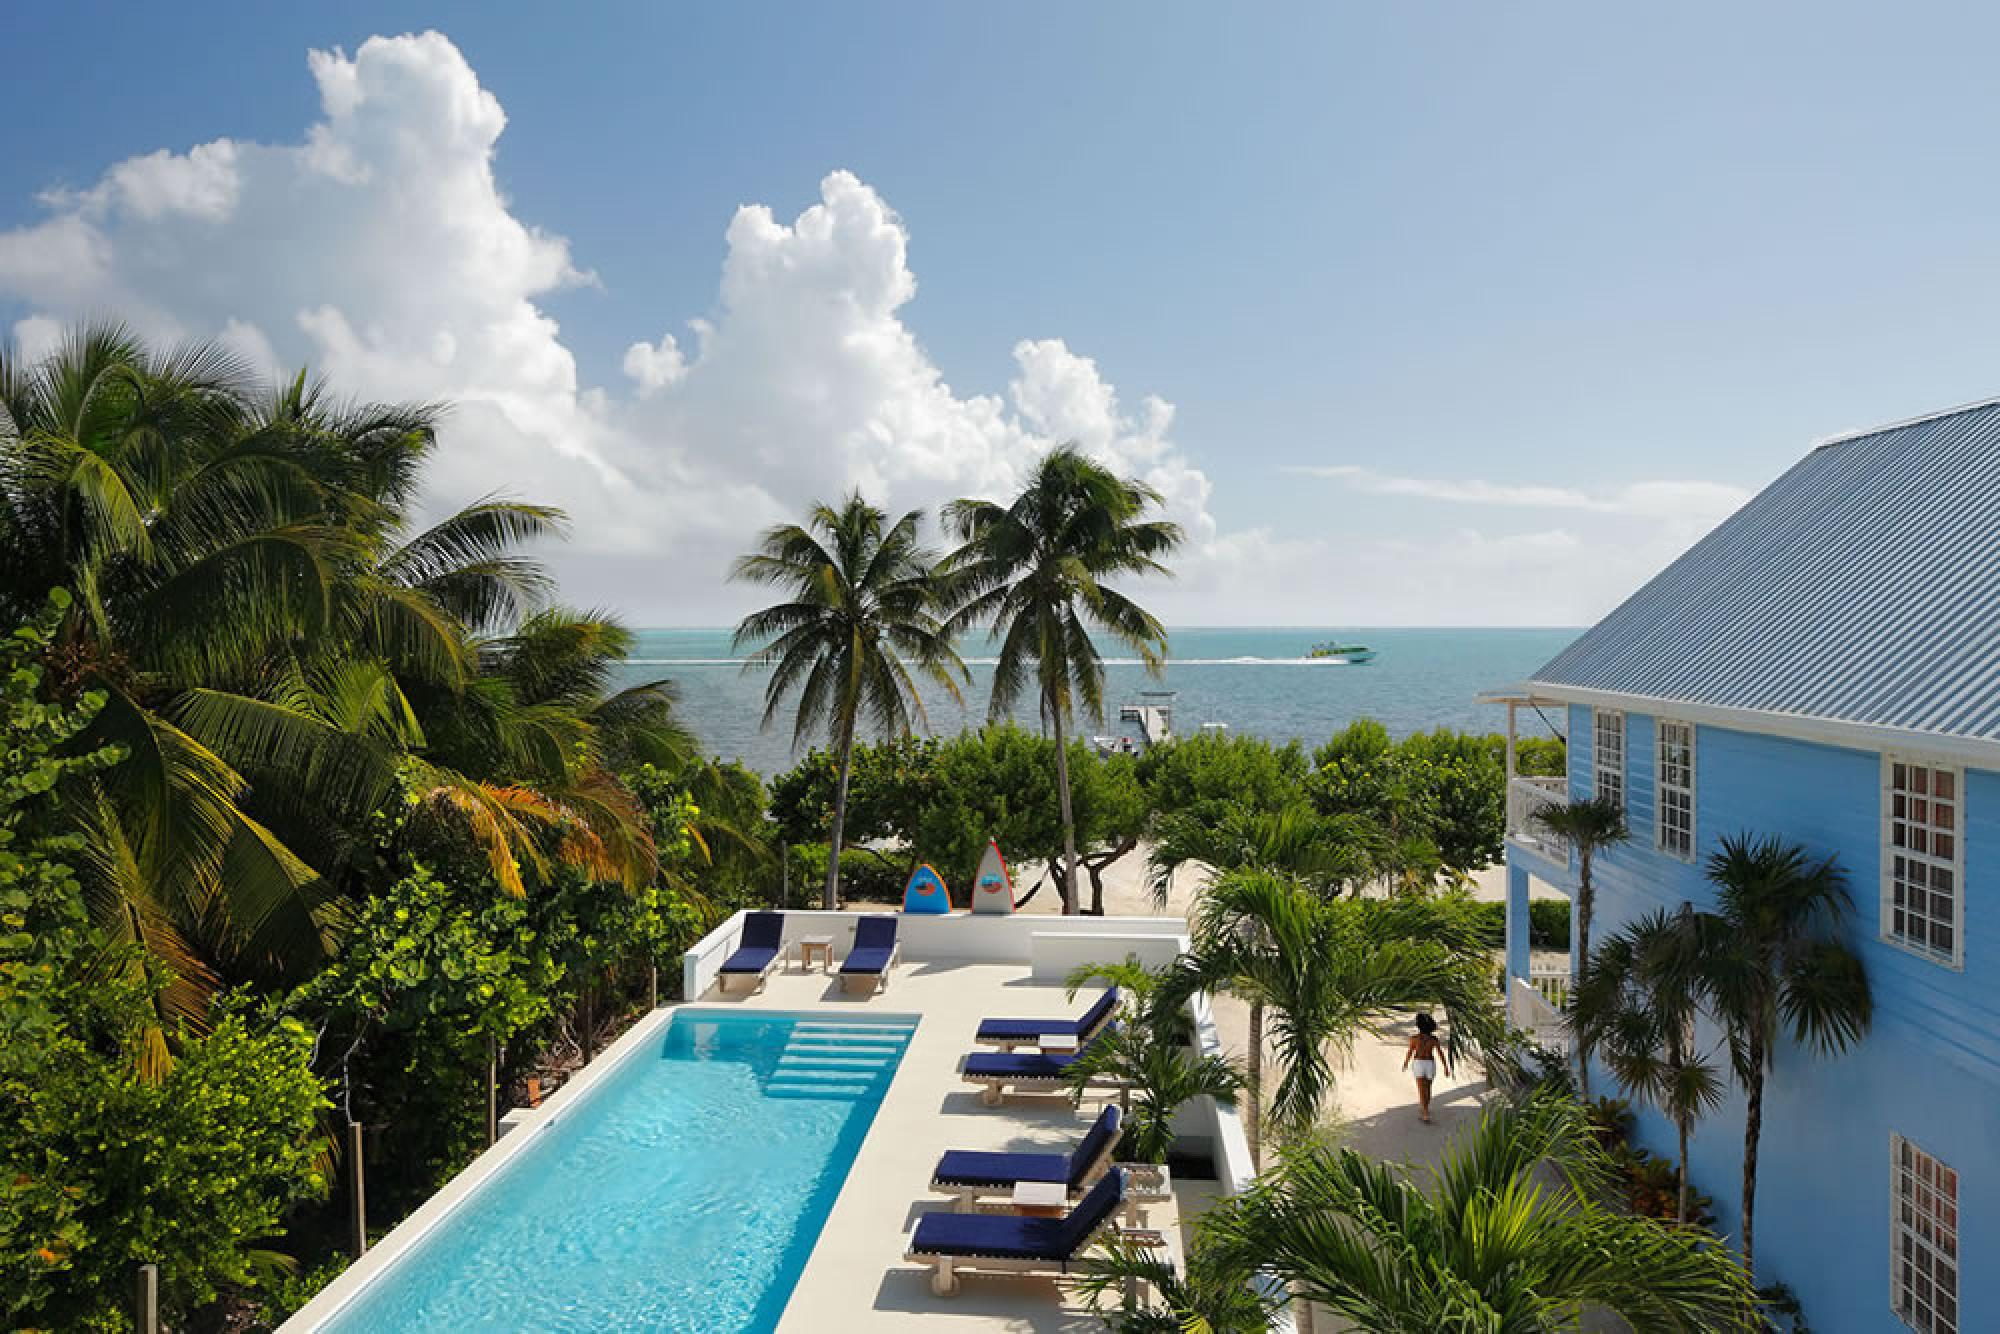 Hoteles Belice - Weezie's Cayo Caulker